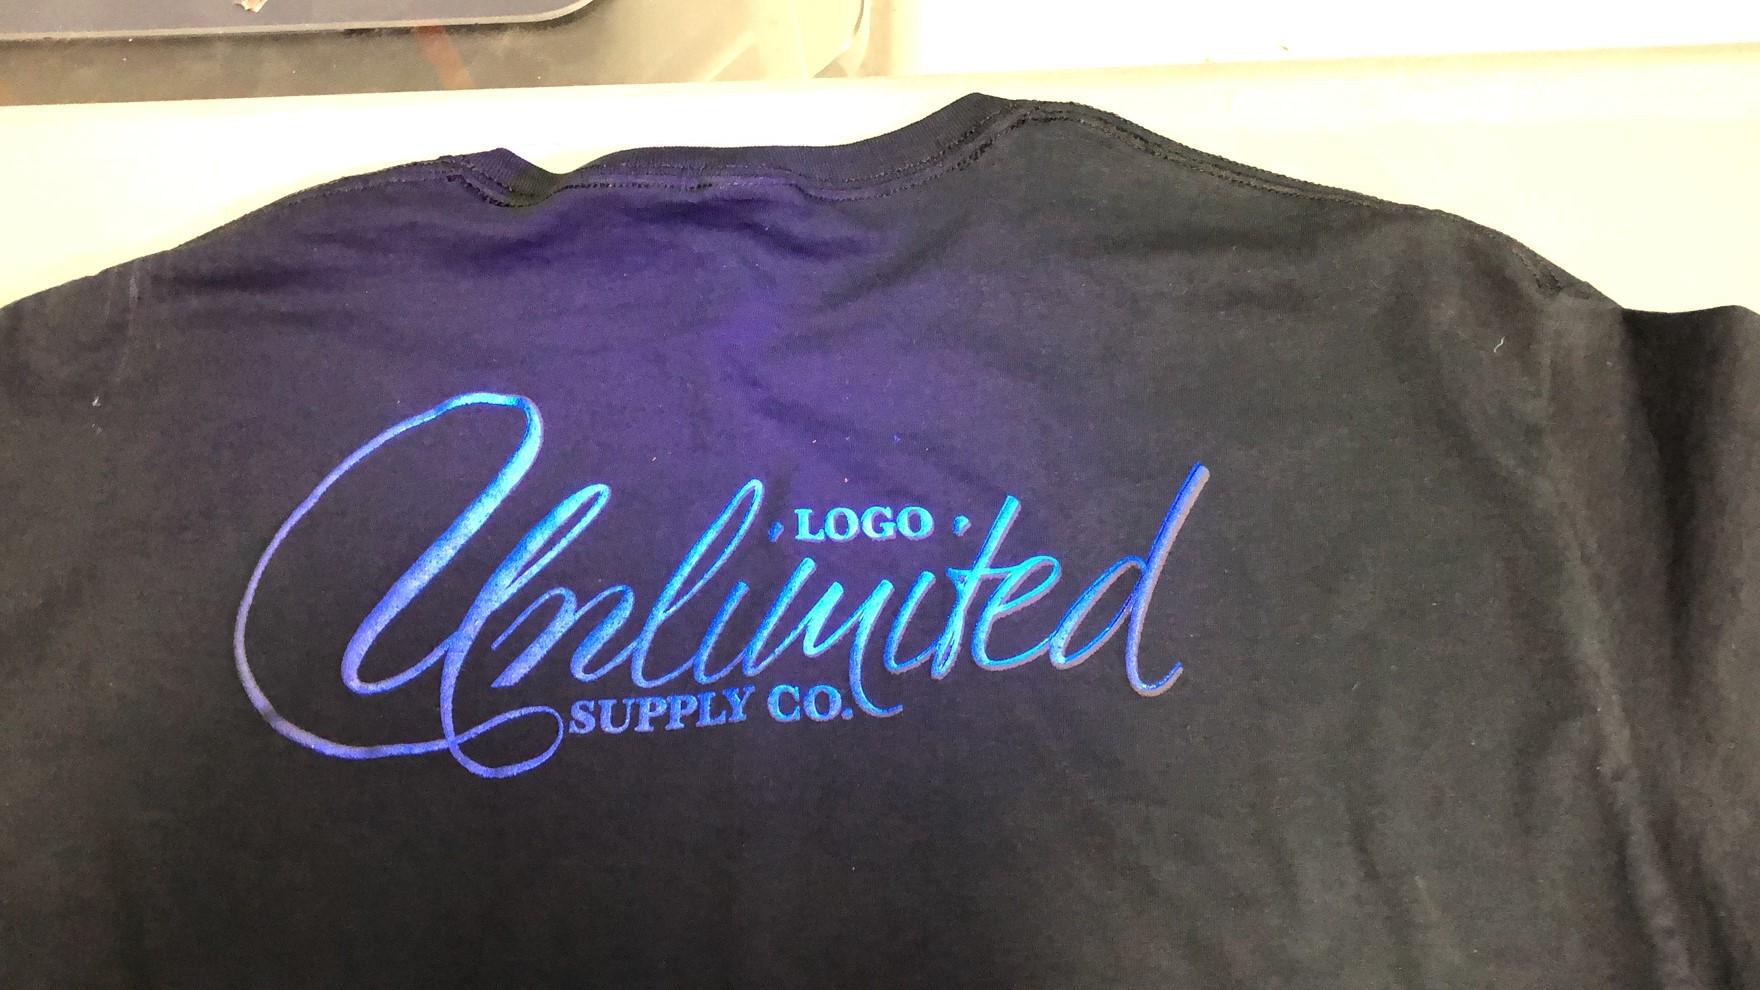 logounltd_laser_etching_embroidery_screen_printing_apparel_uniform_custom_tshirts_kirkland_bellevue_seattle_redmond_woodinville_branded_merchandise_promotional_products_logo_unltd_black_light_glow_dark (1).JPG